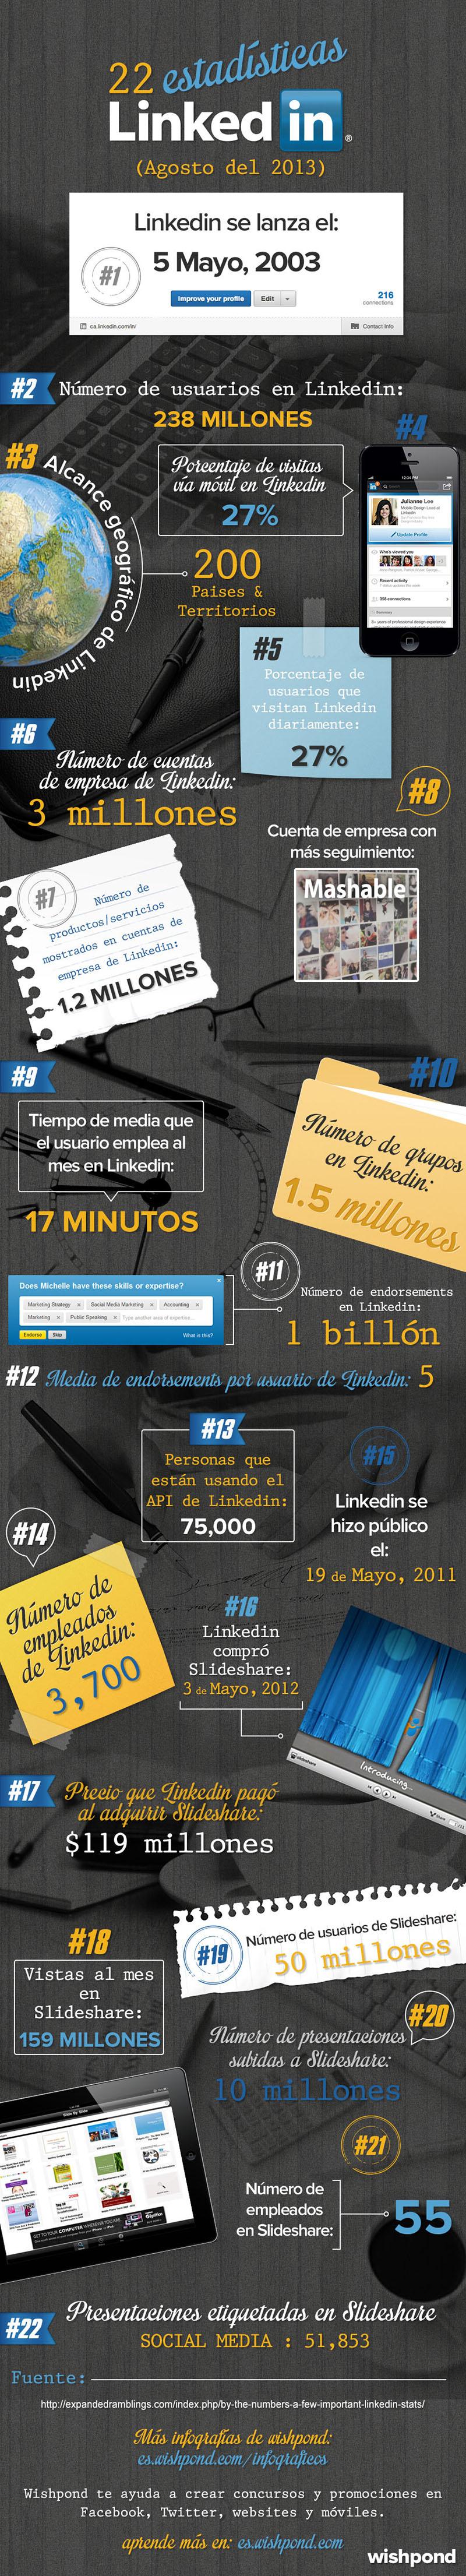 Infographic_Linkedin_Stats_ES